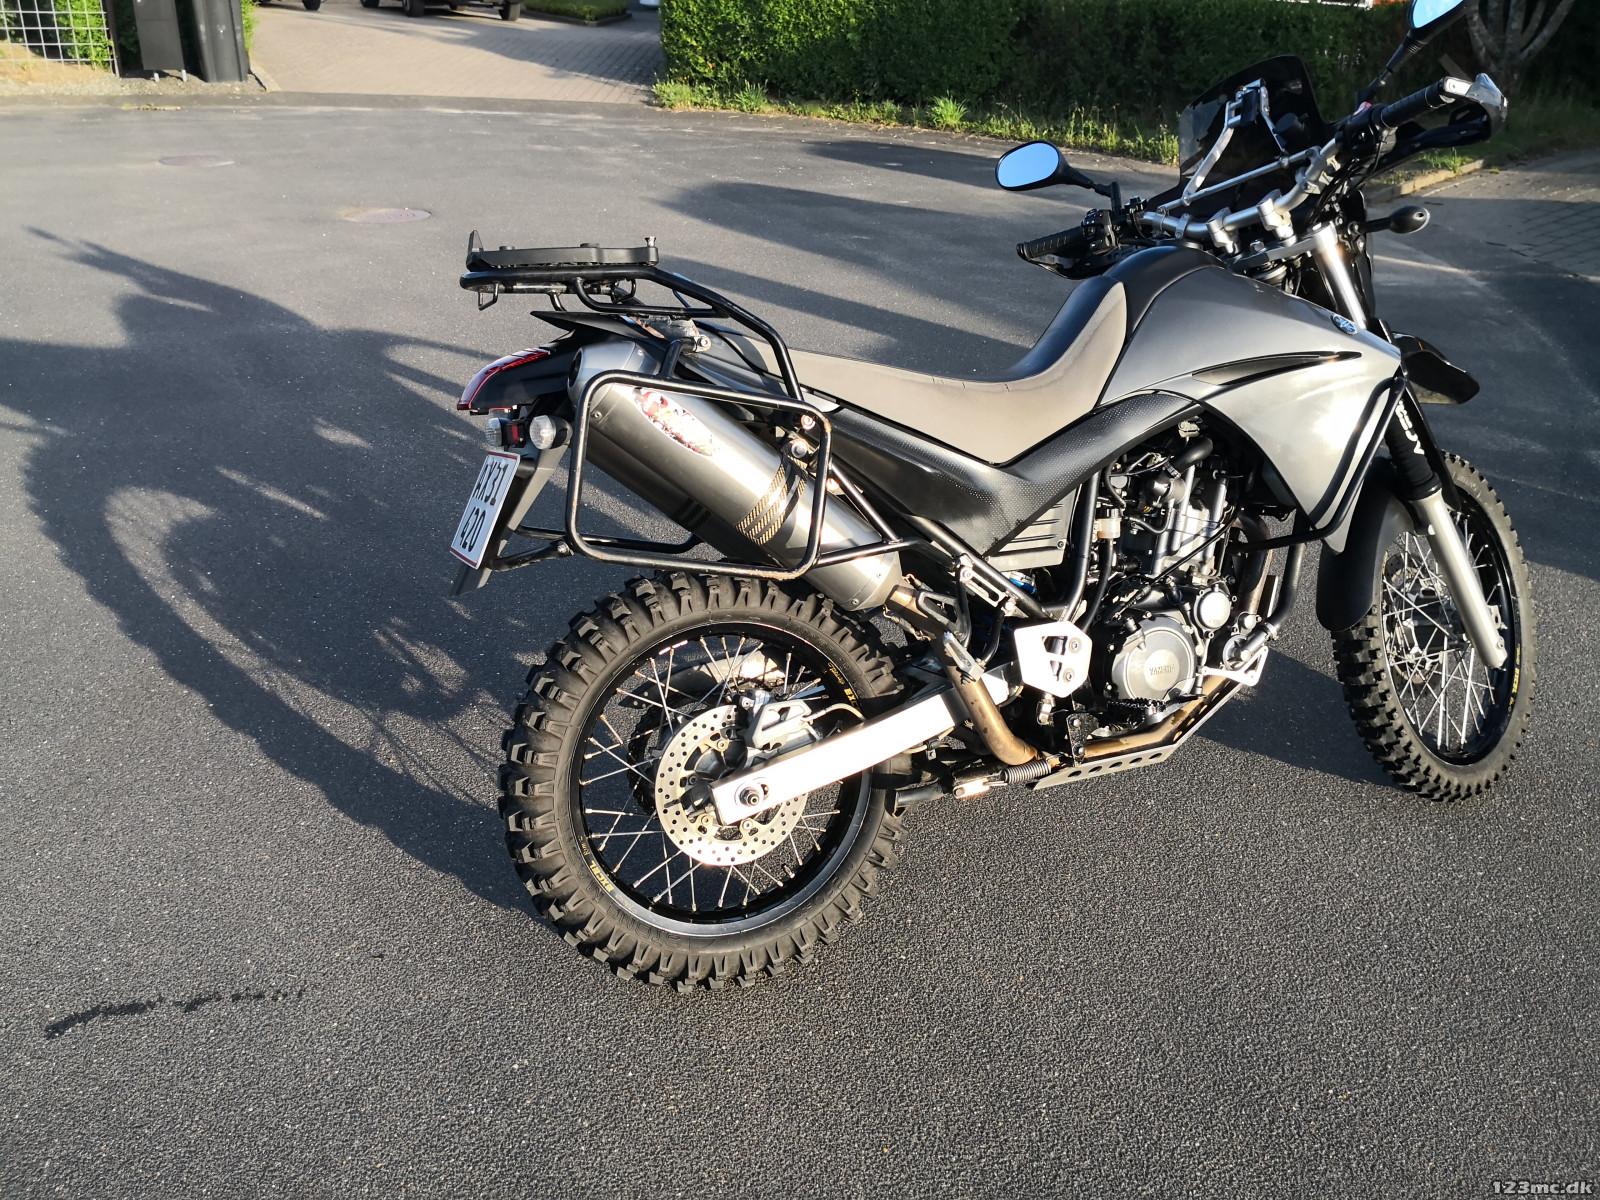 Moto Yamaha XT 660 R - 2006 - R$ 18800.0